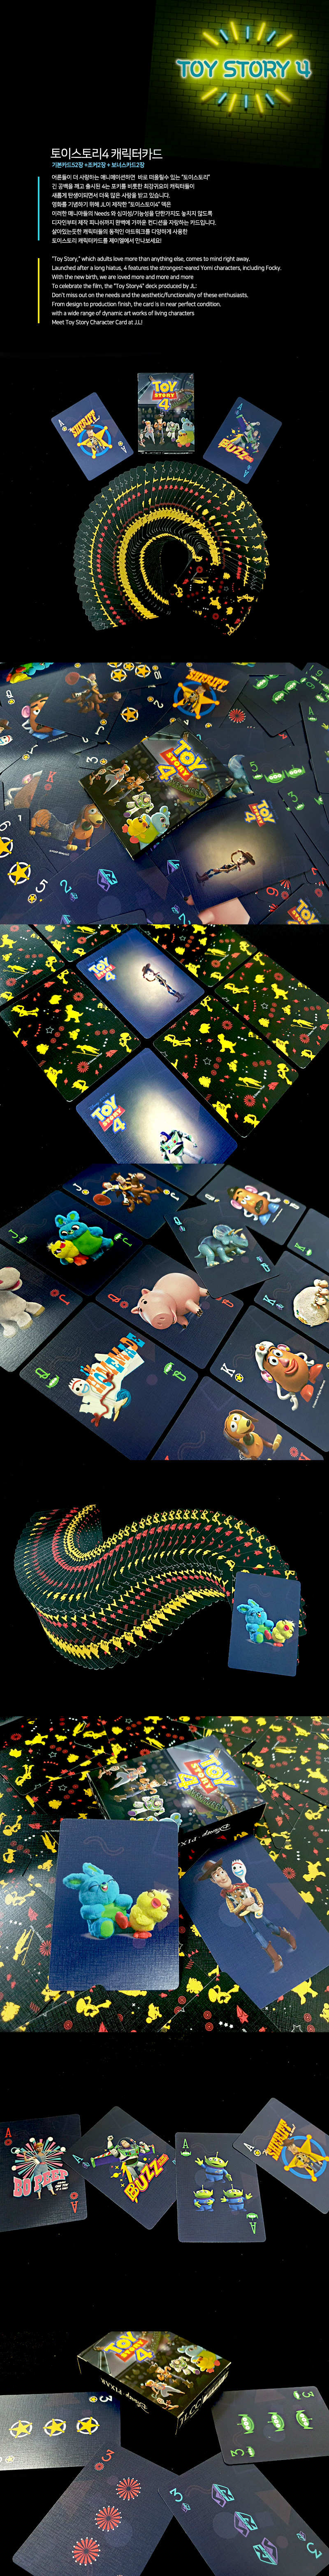 JLCC 디즈니 토이스토리4 캐릭터 덱 플레잉 카드 - 마블, 17,000원, 카드마술, 카드마술